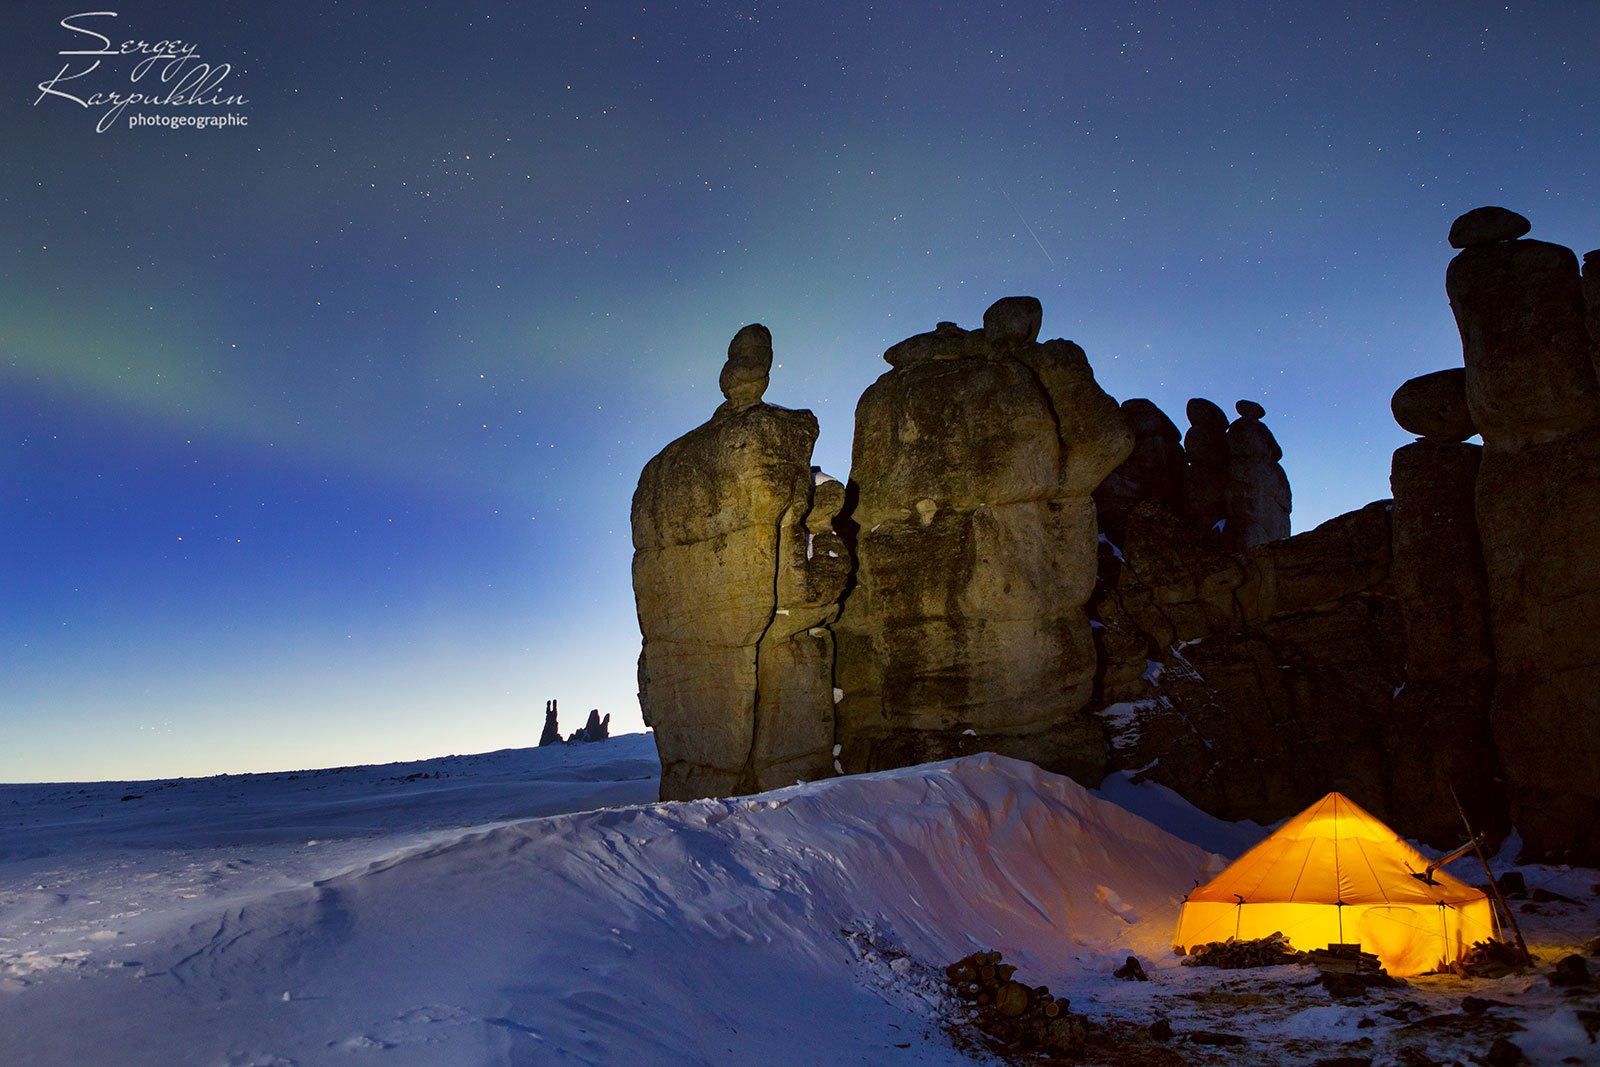 якутия, улахан-сис, северное сияние, зима, Сергей Карпухин